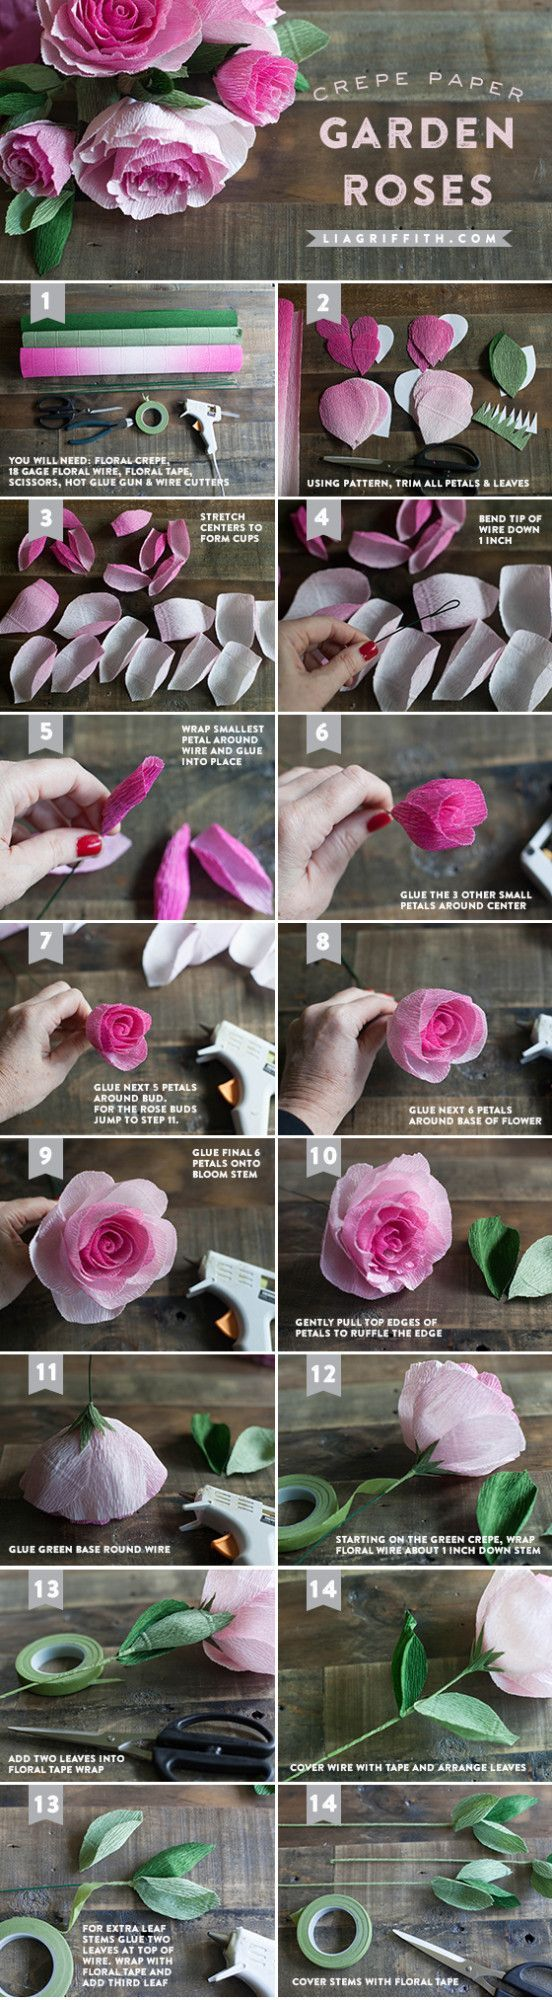 Crepe Paper Ombré Garden Roses